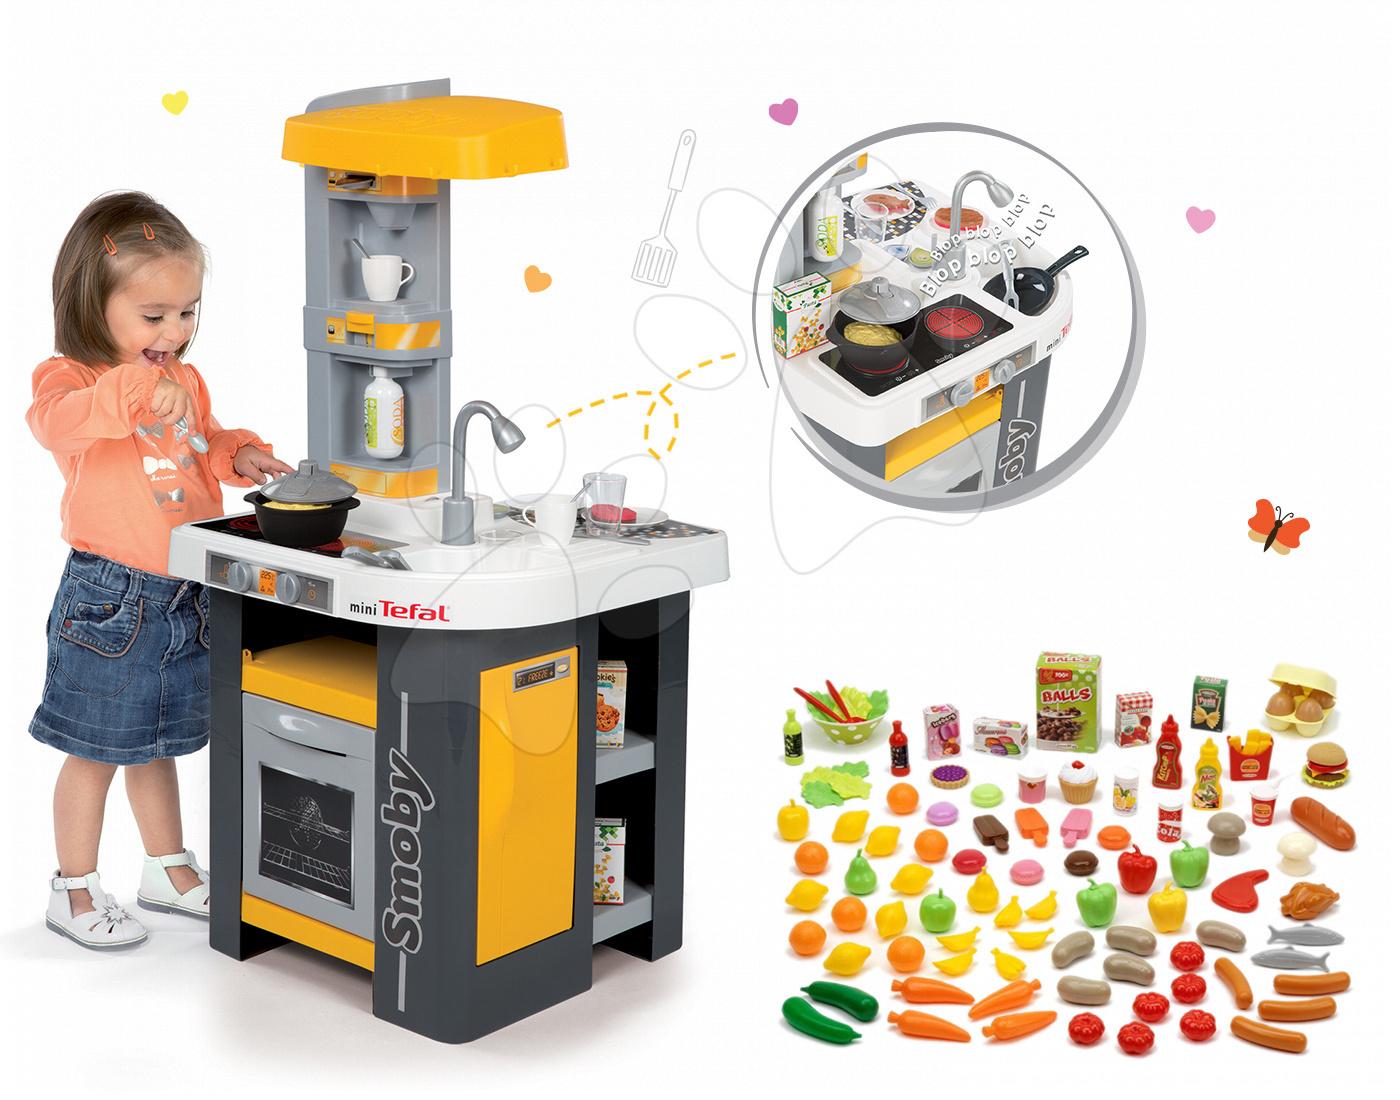 Set kuchyňka Tefal Studio Smoby s automatem na sodu, sada potravin do kuchyňky